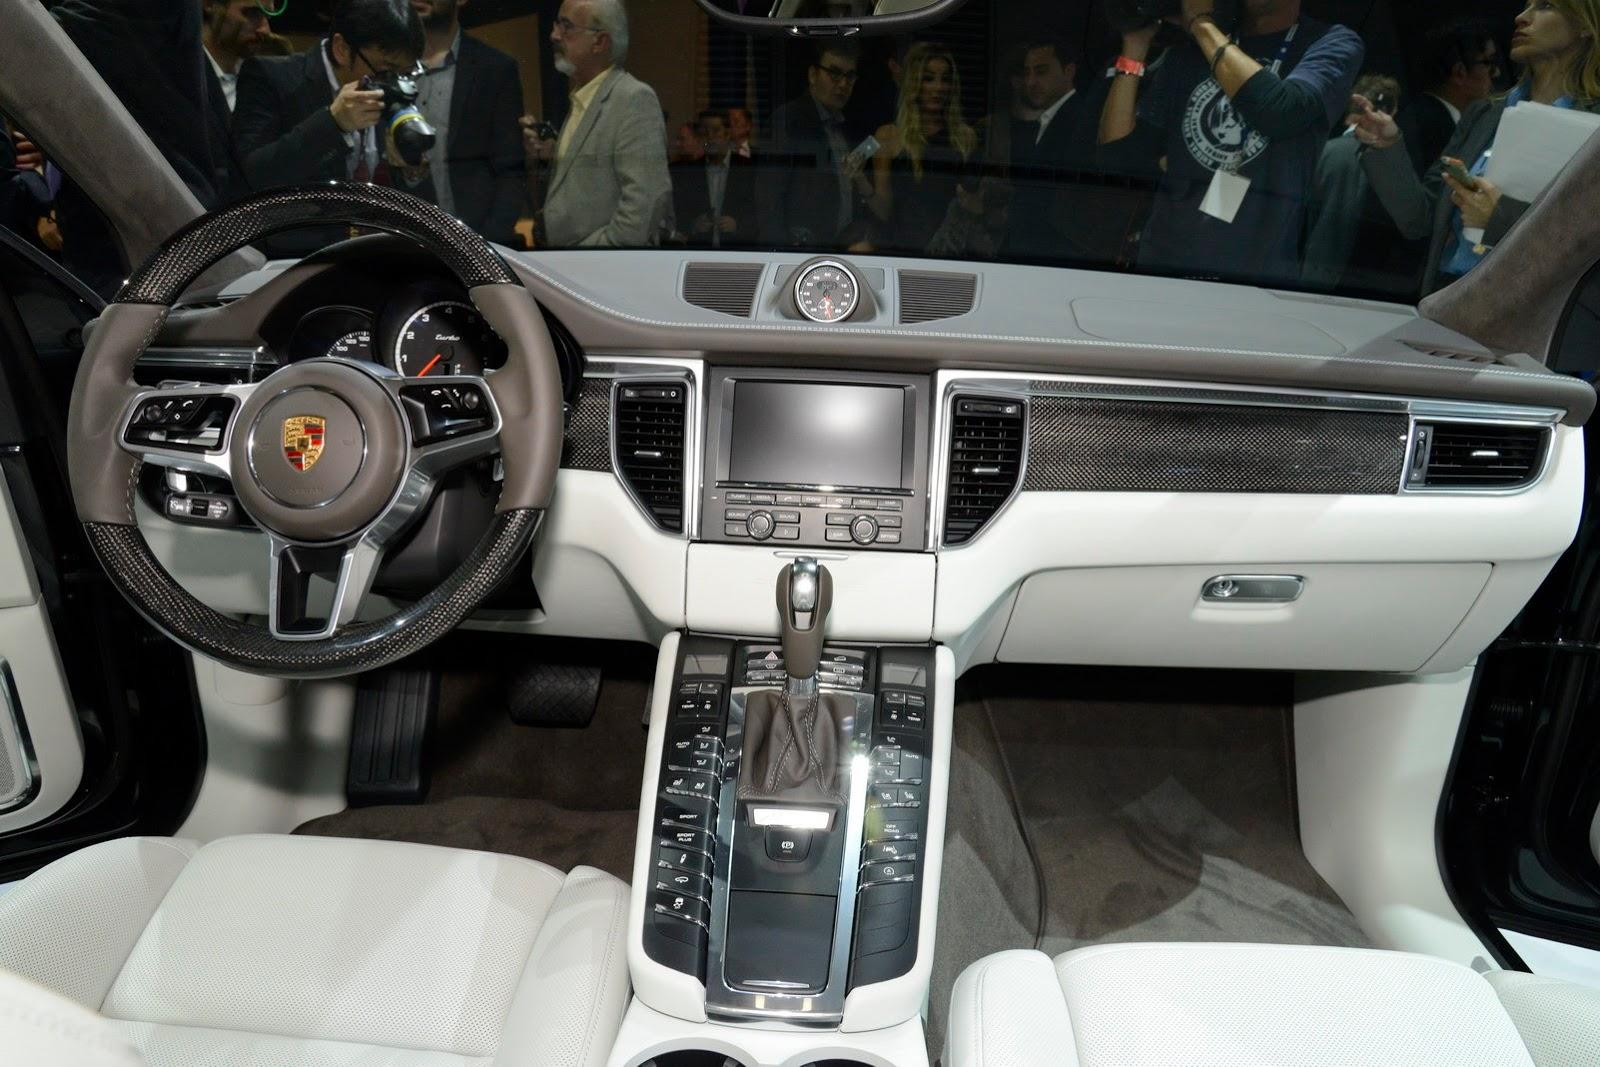 New-Porsche-Macan-Cockpit-Nice-wallpaper-wp4809057